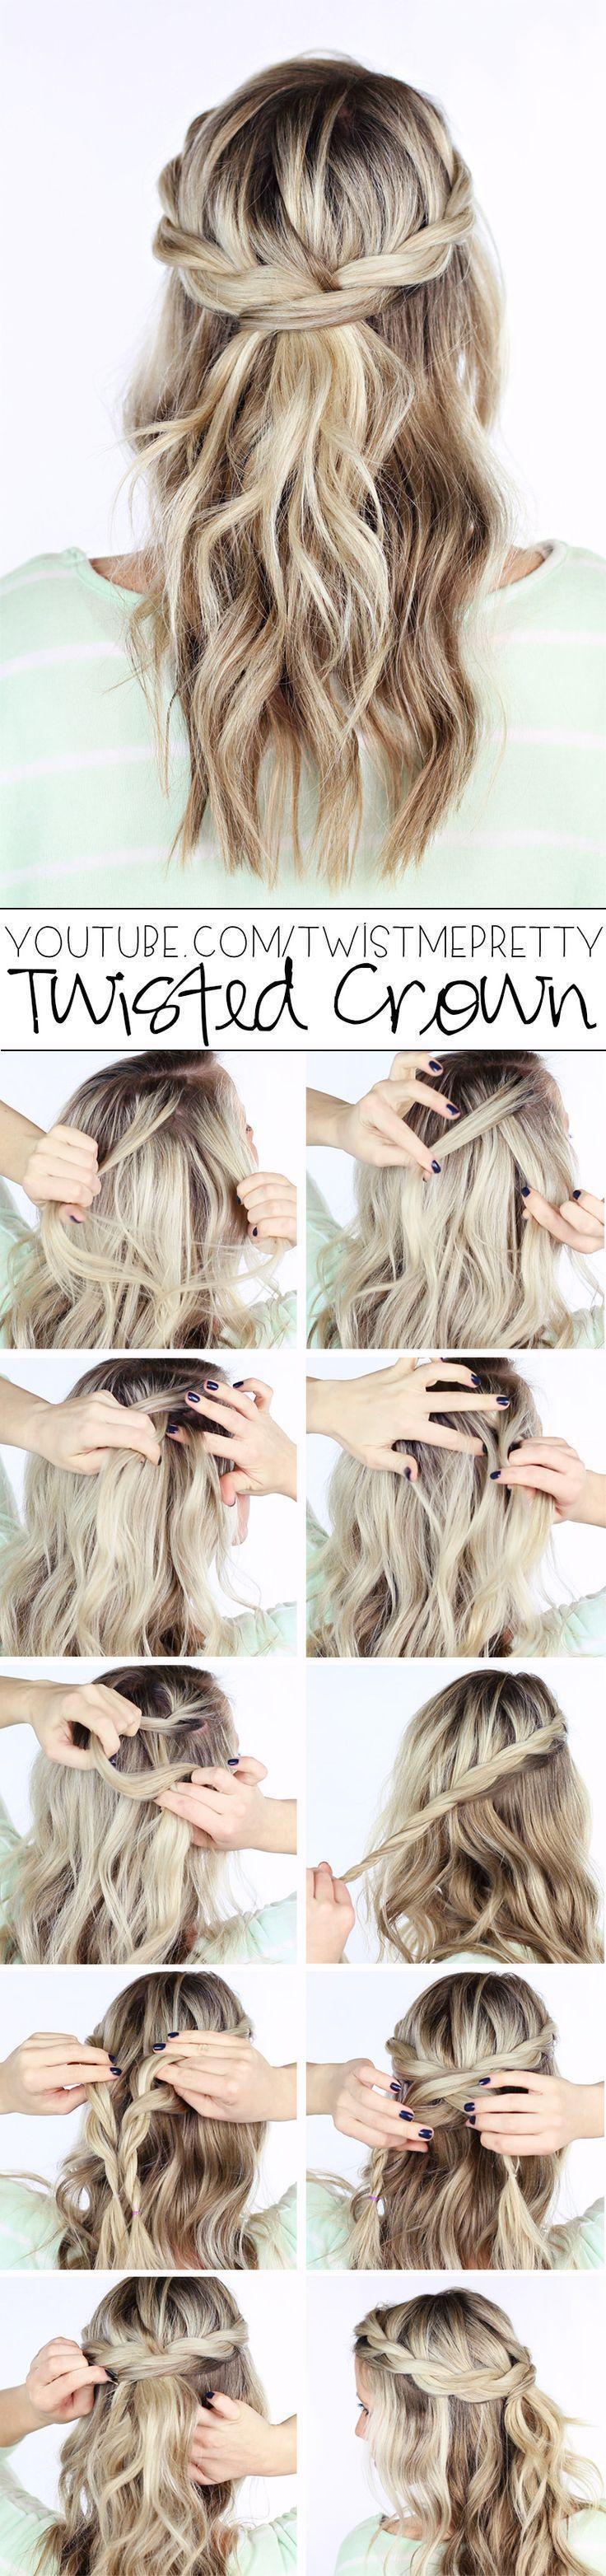 easy tutorials to make wedding hair boho diy floral crown and